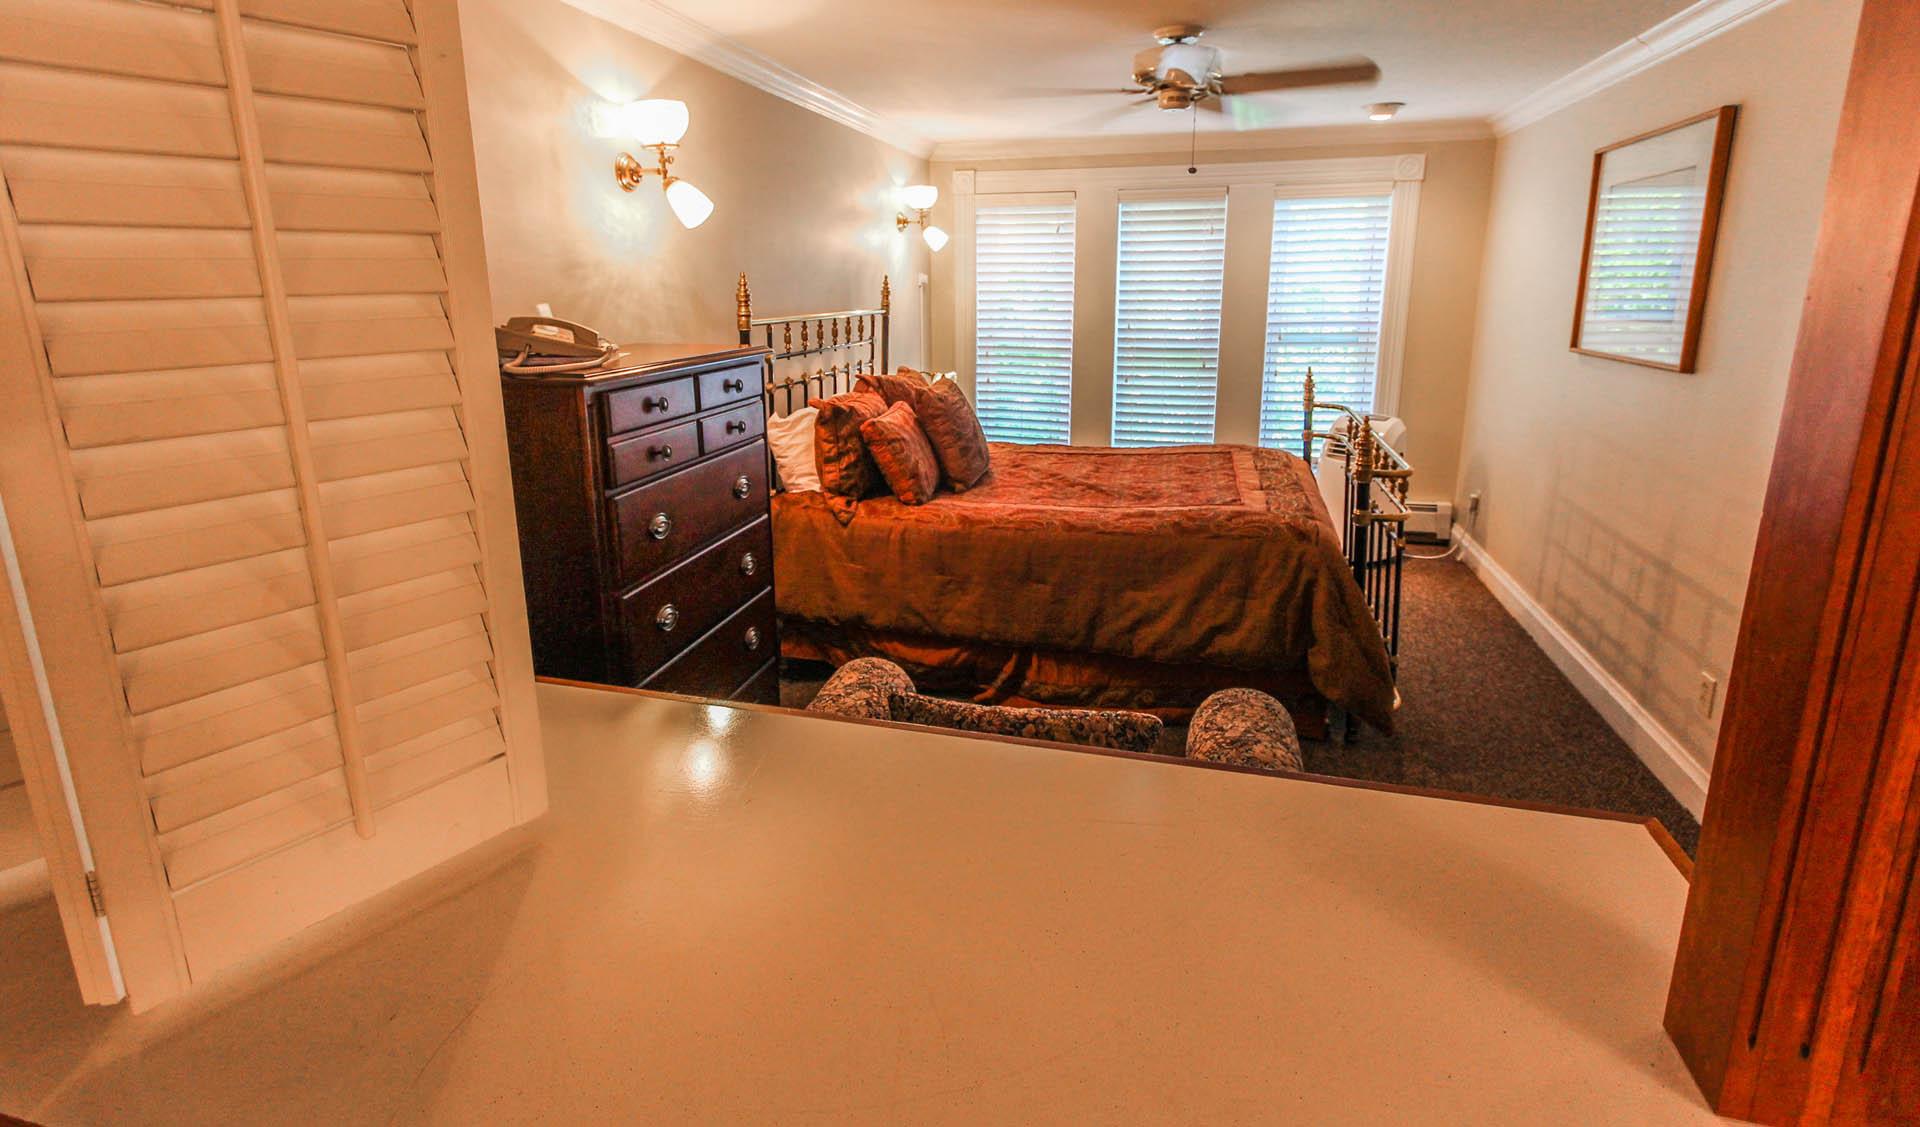 Park Hotel Bedroom